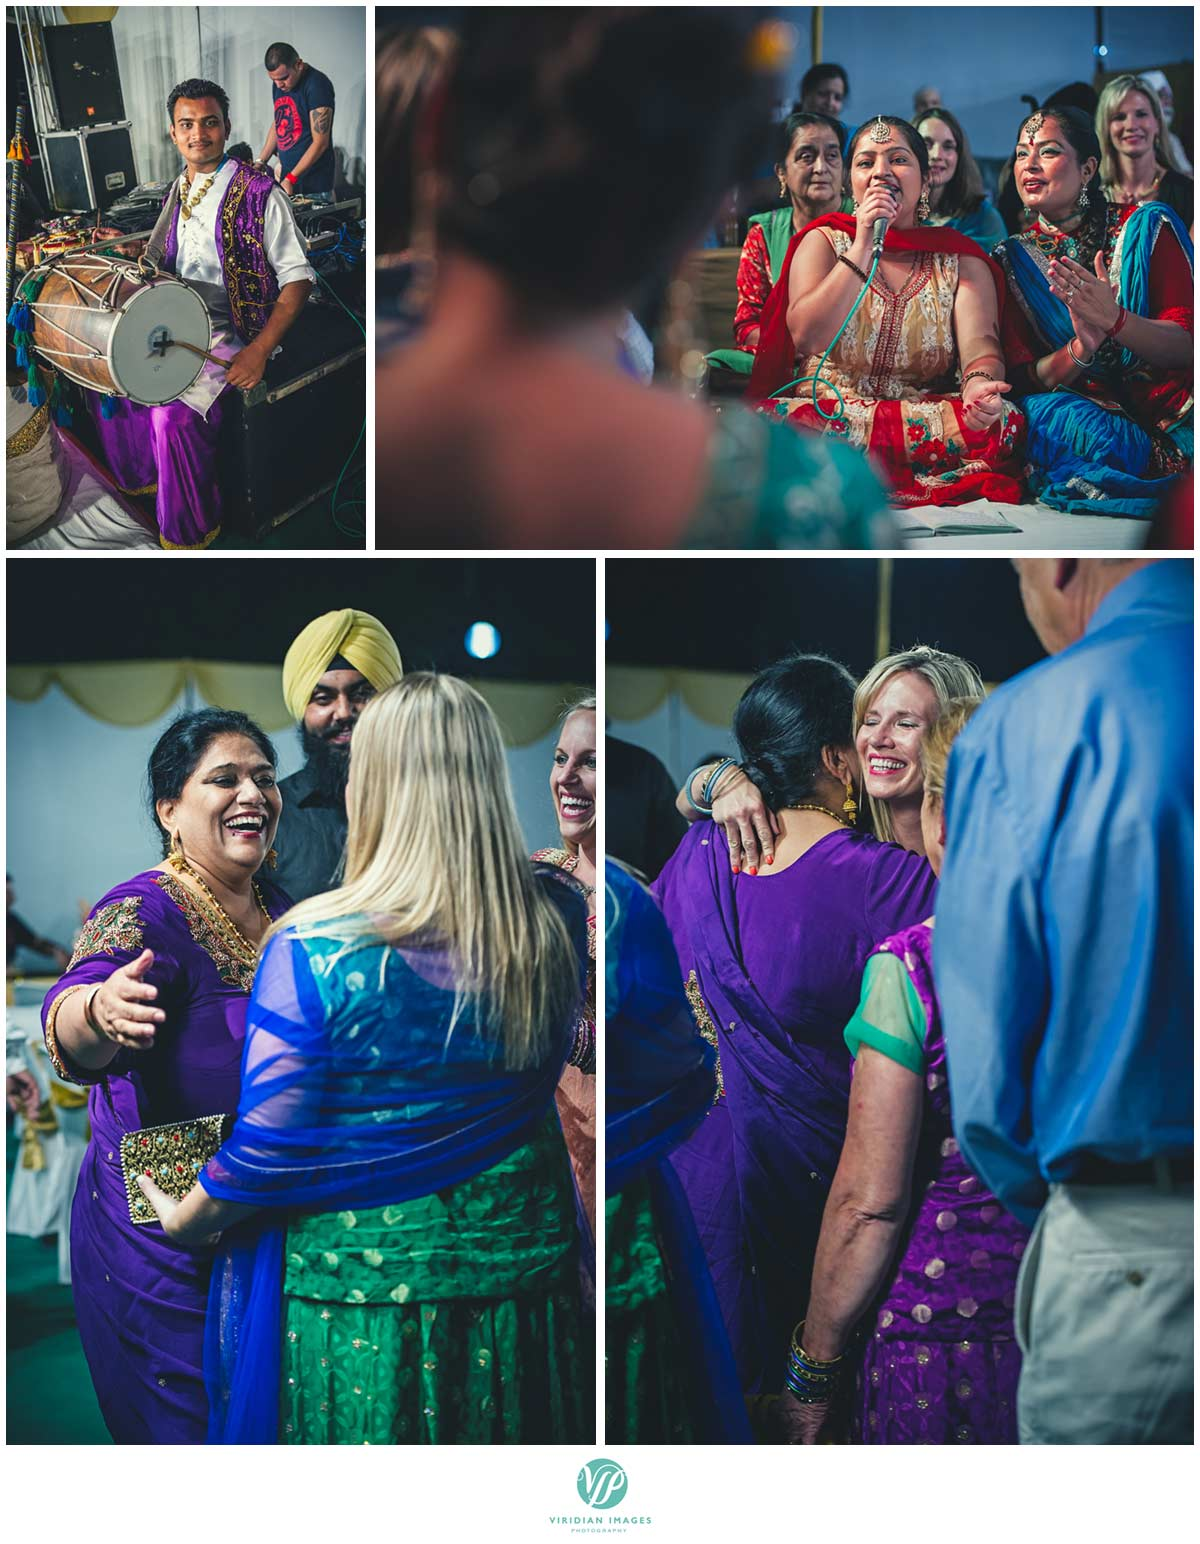 India_Chandigarh_Sangeet_Viridian_Images_Photography_poto_2